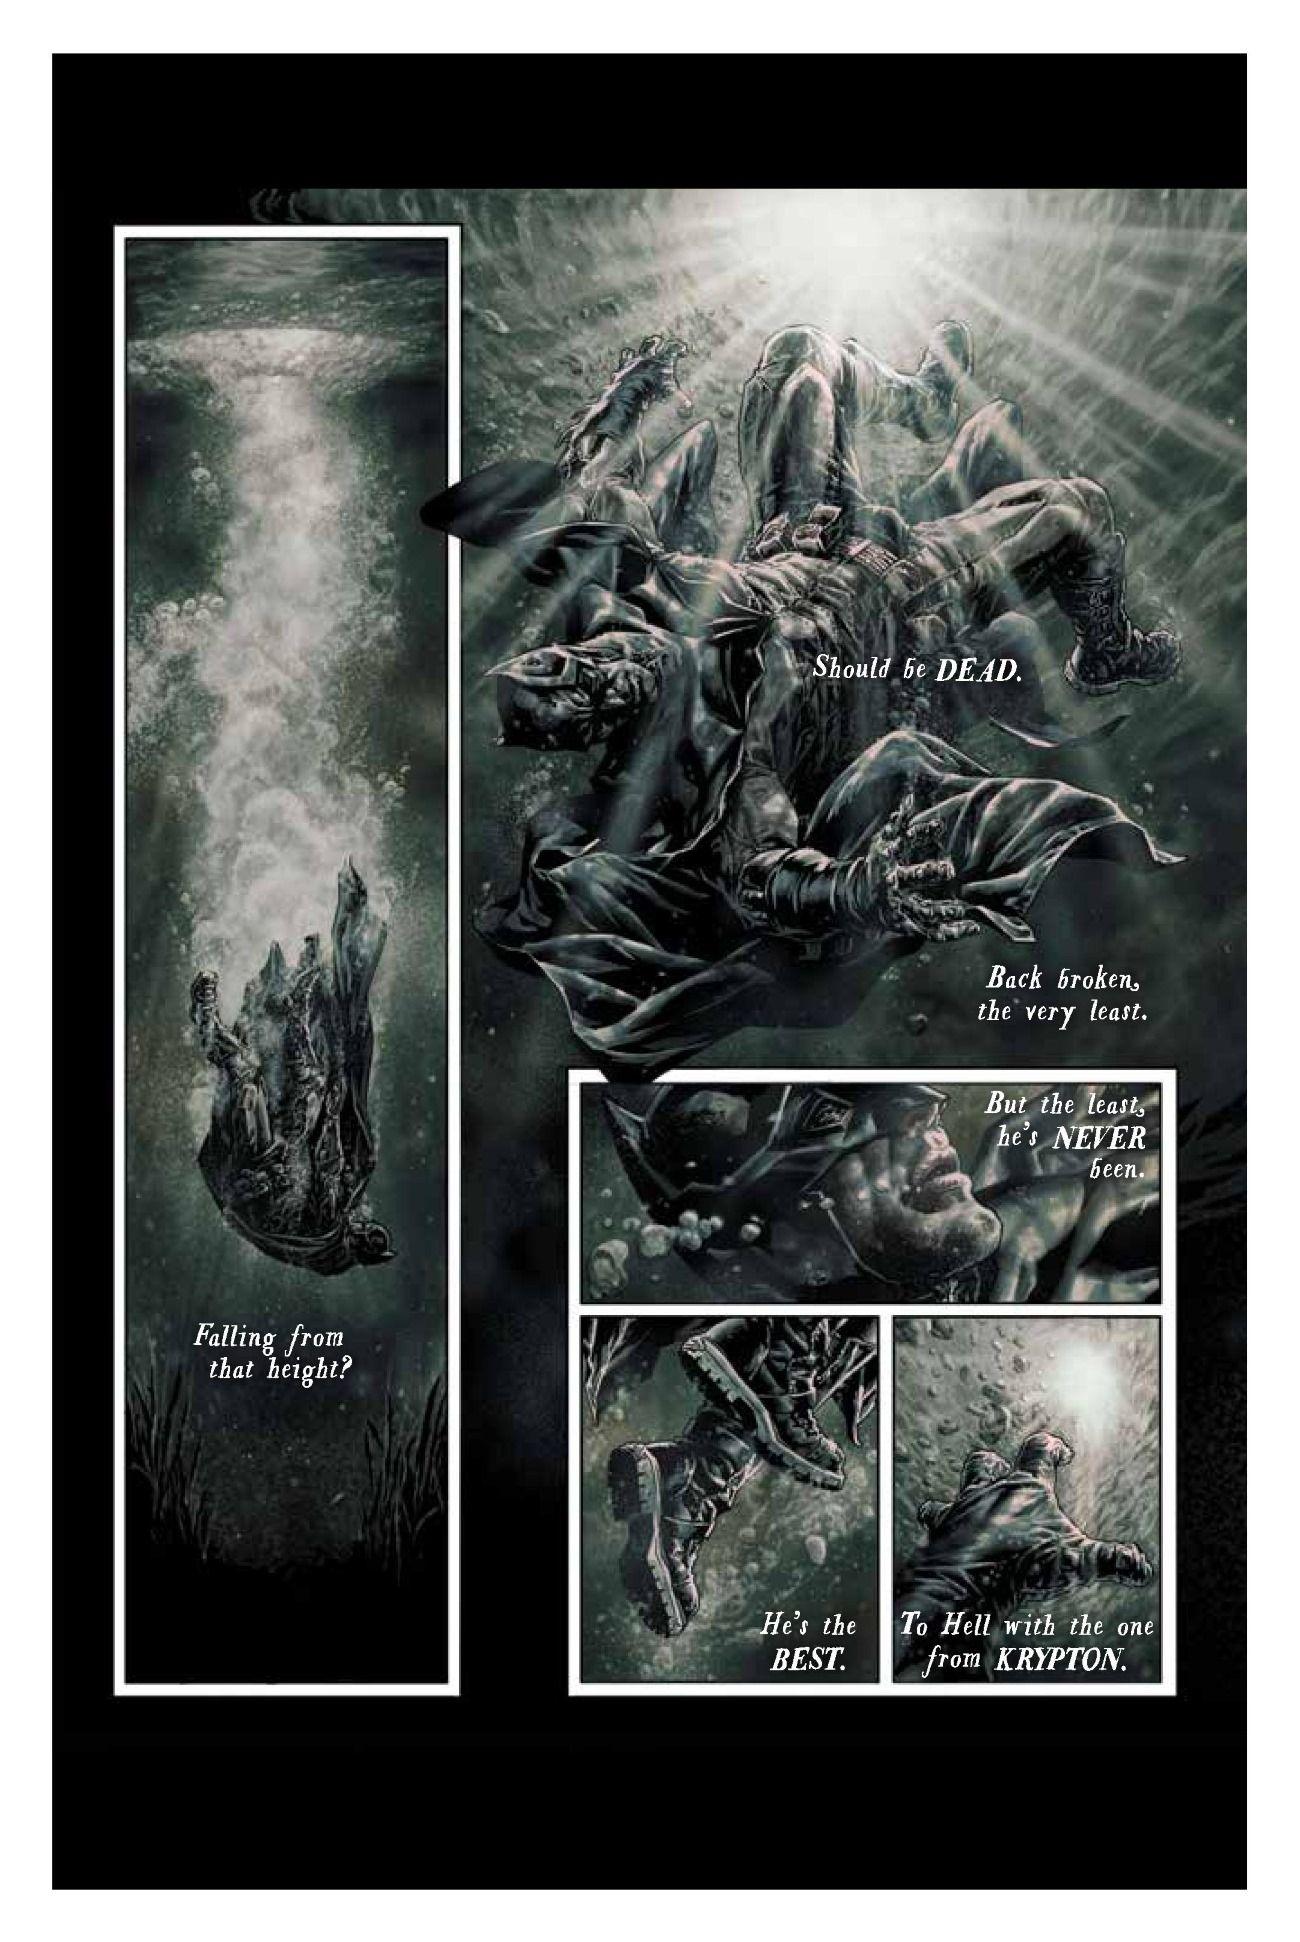 https://static2.srcdn.com/wordpress/wp-content/uploads/2018/08/Batman-Damned-Preview-Page-1.jpg